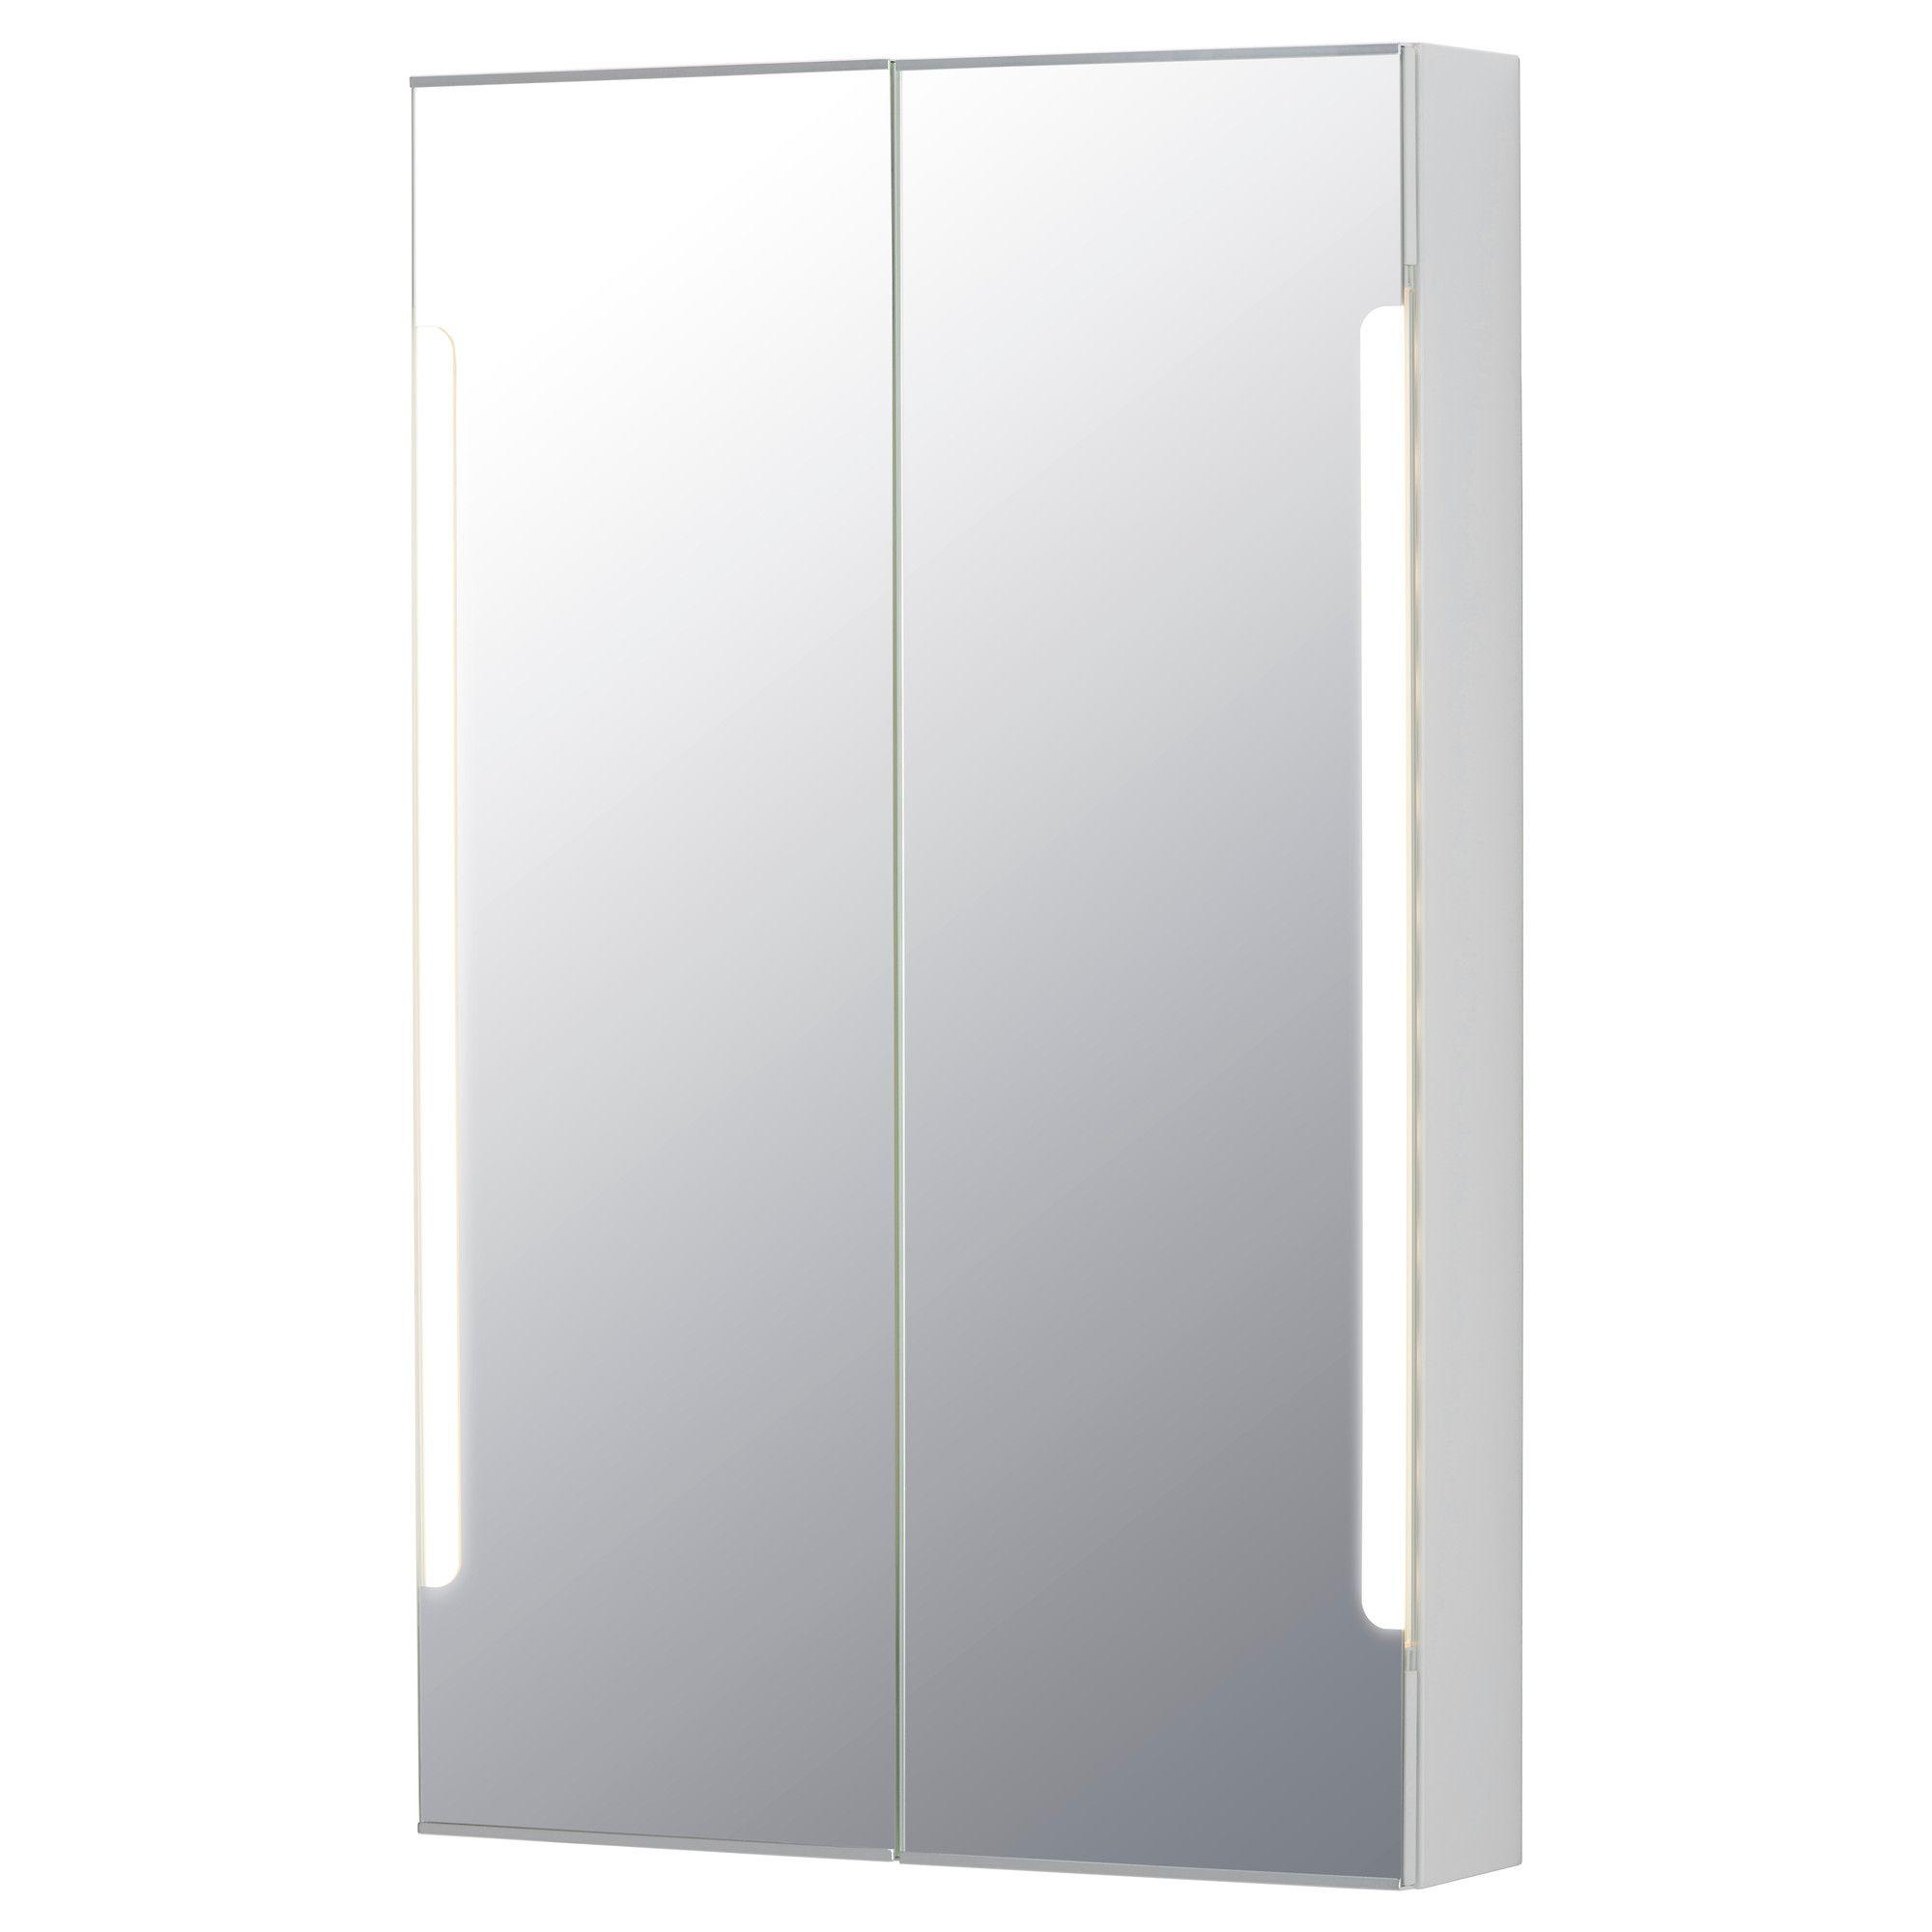 storjorm spiegelschrank m 2 t ren int bel wei einrichtung pinterest badmoebel. Black Bedroom Furniture Sets. Home Design Ideas